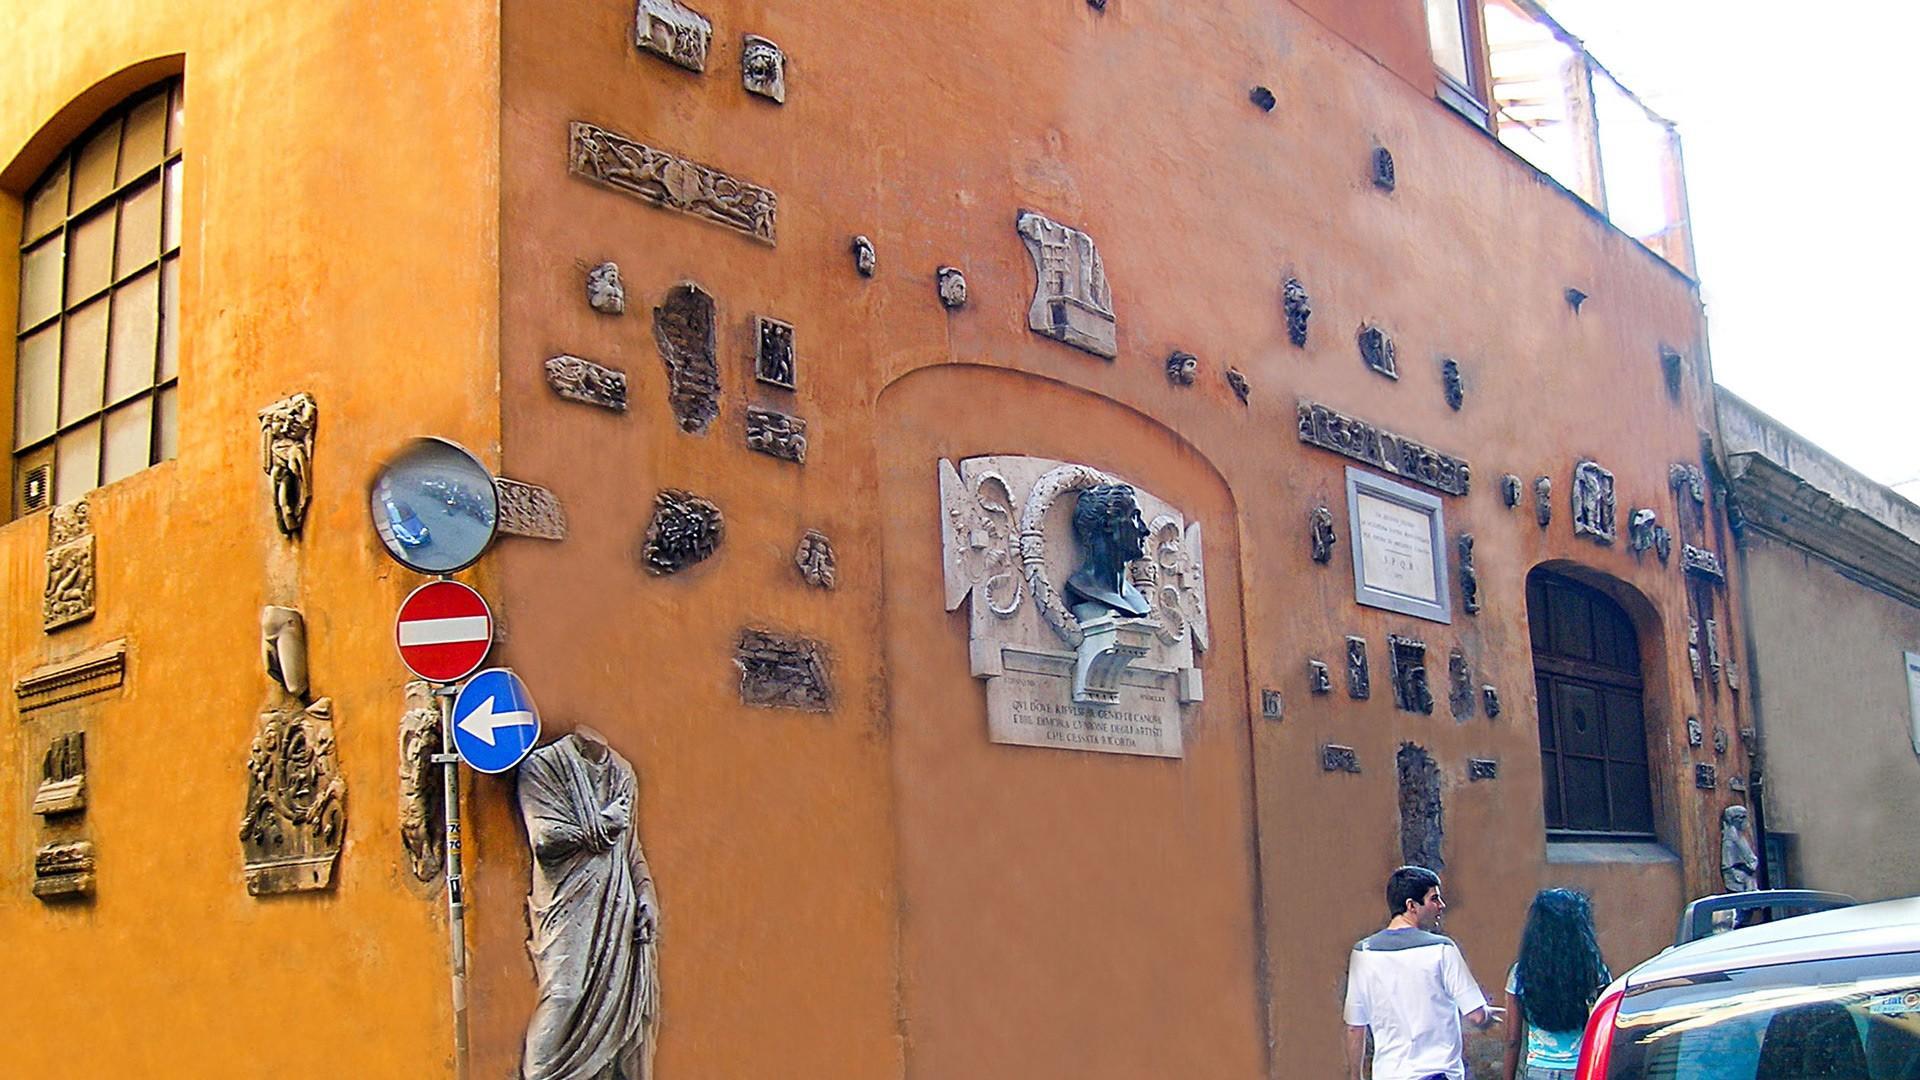 Home of famous neo-classical sculptor Antonio Canova (1757-1822) is just across the Via del Corso.